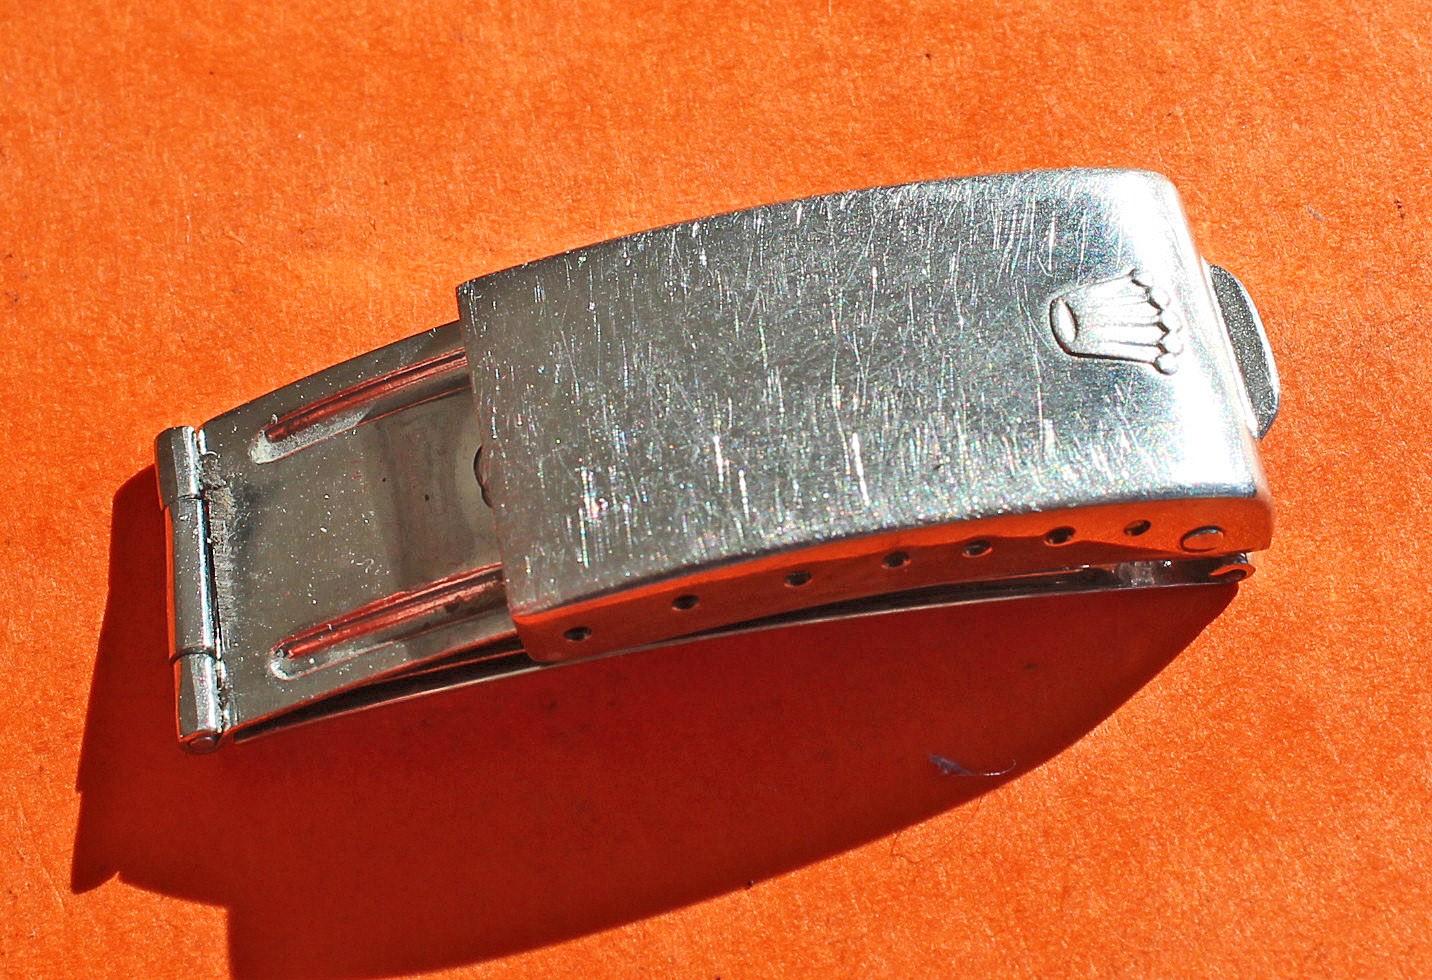 ROLEX 2000 VINTAGE WATCH FOLDED CLASP DEPLOYANT Ref 78350 19mm BRACELETS OYSTER CODE AD2